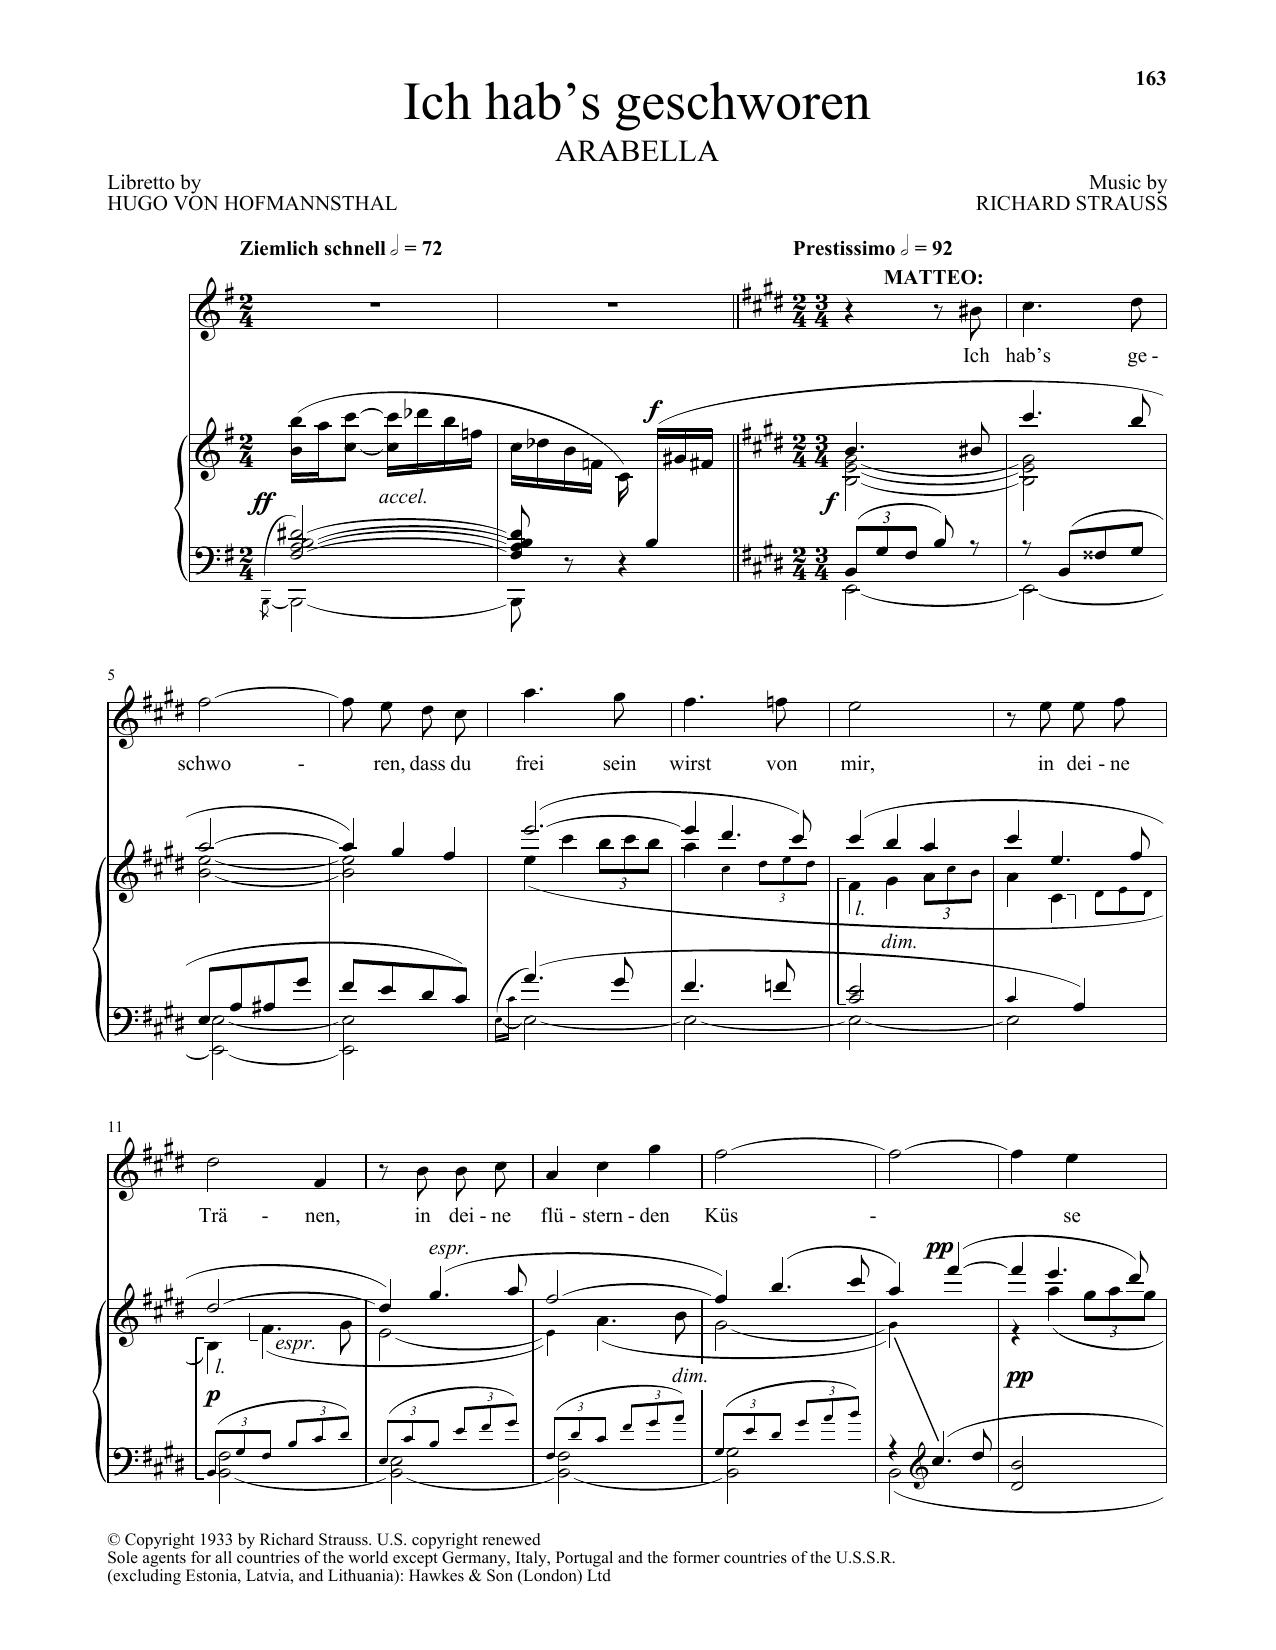 Ich Hab's Geschworen (Piano & Vocal)